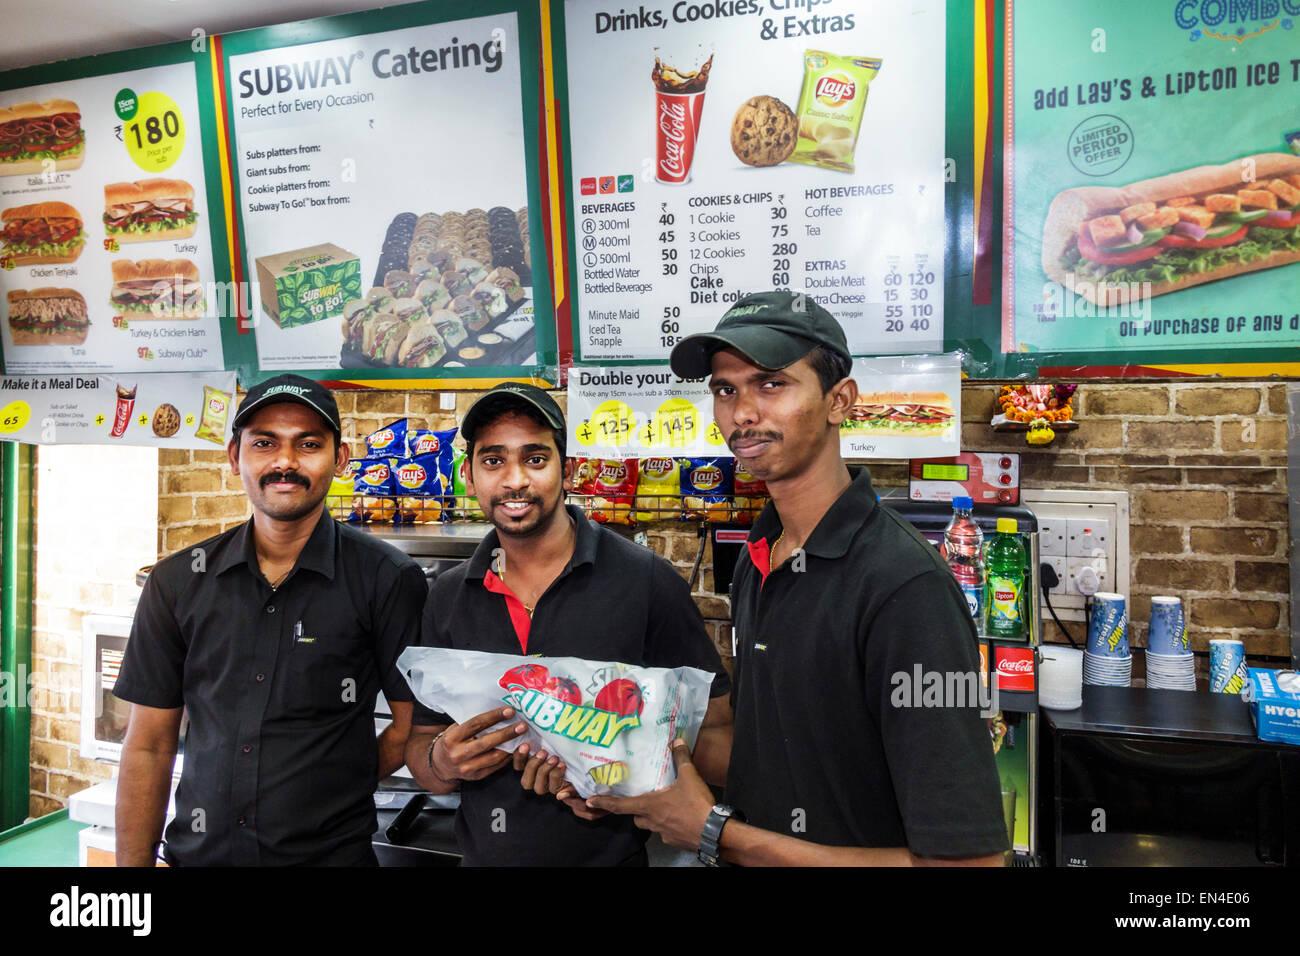 Mumbai India Asian Churchgate Jamshedji Tata Road Subway sandwich shop ristorante uomo dipendente uniforme dei colleghi Immagini Stock